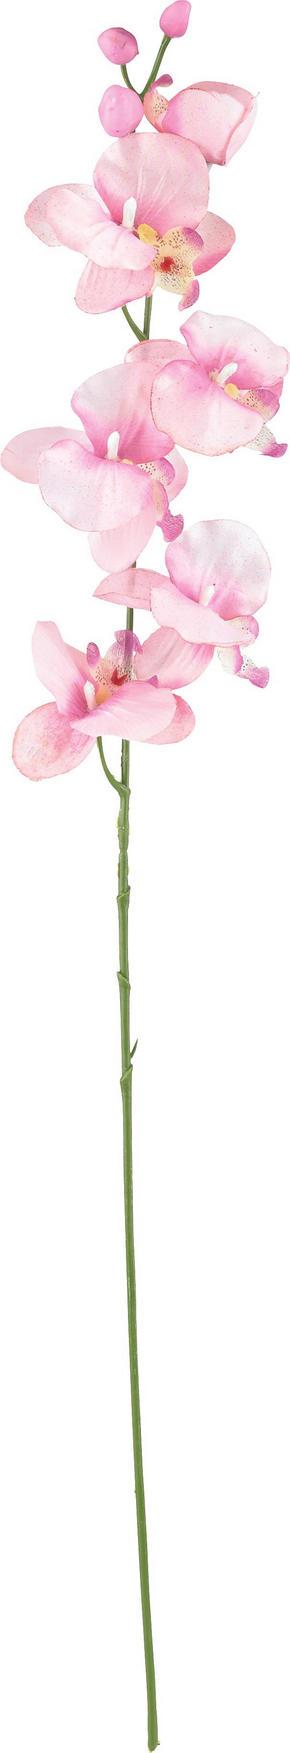 KONSTGJORD BLOMMA - pink/grön, Basics, textil/plast (72cm)